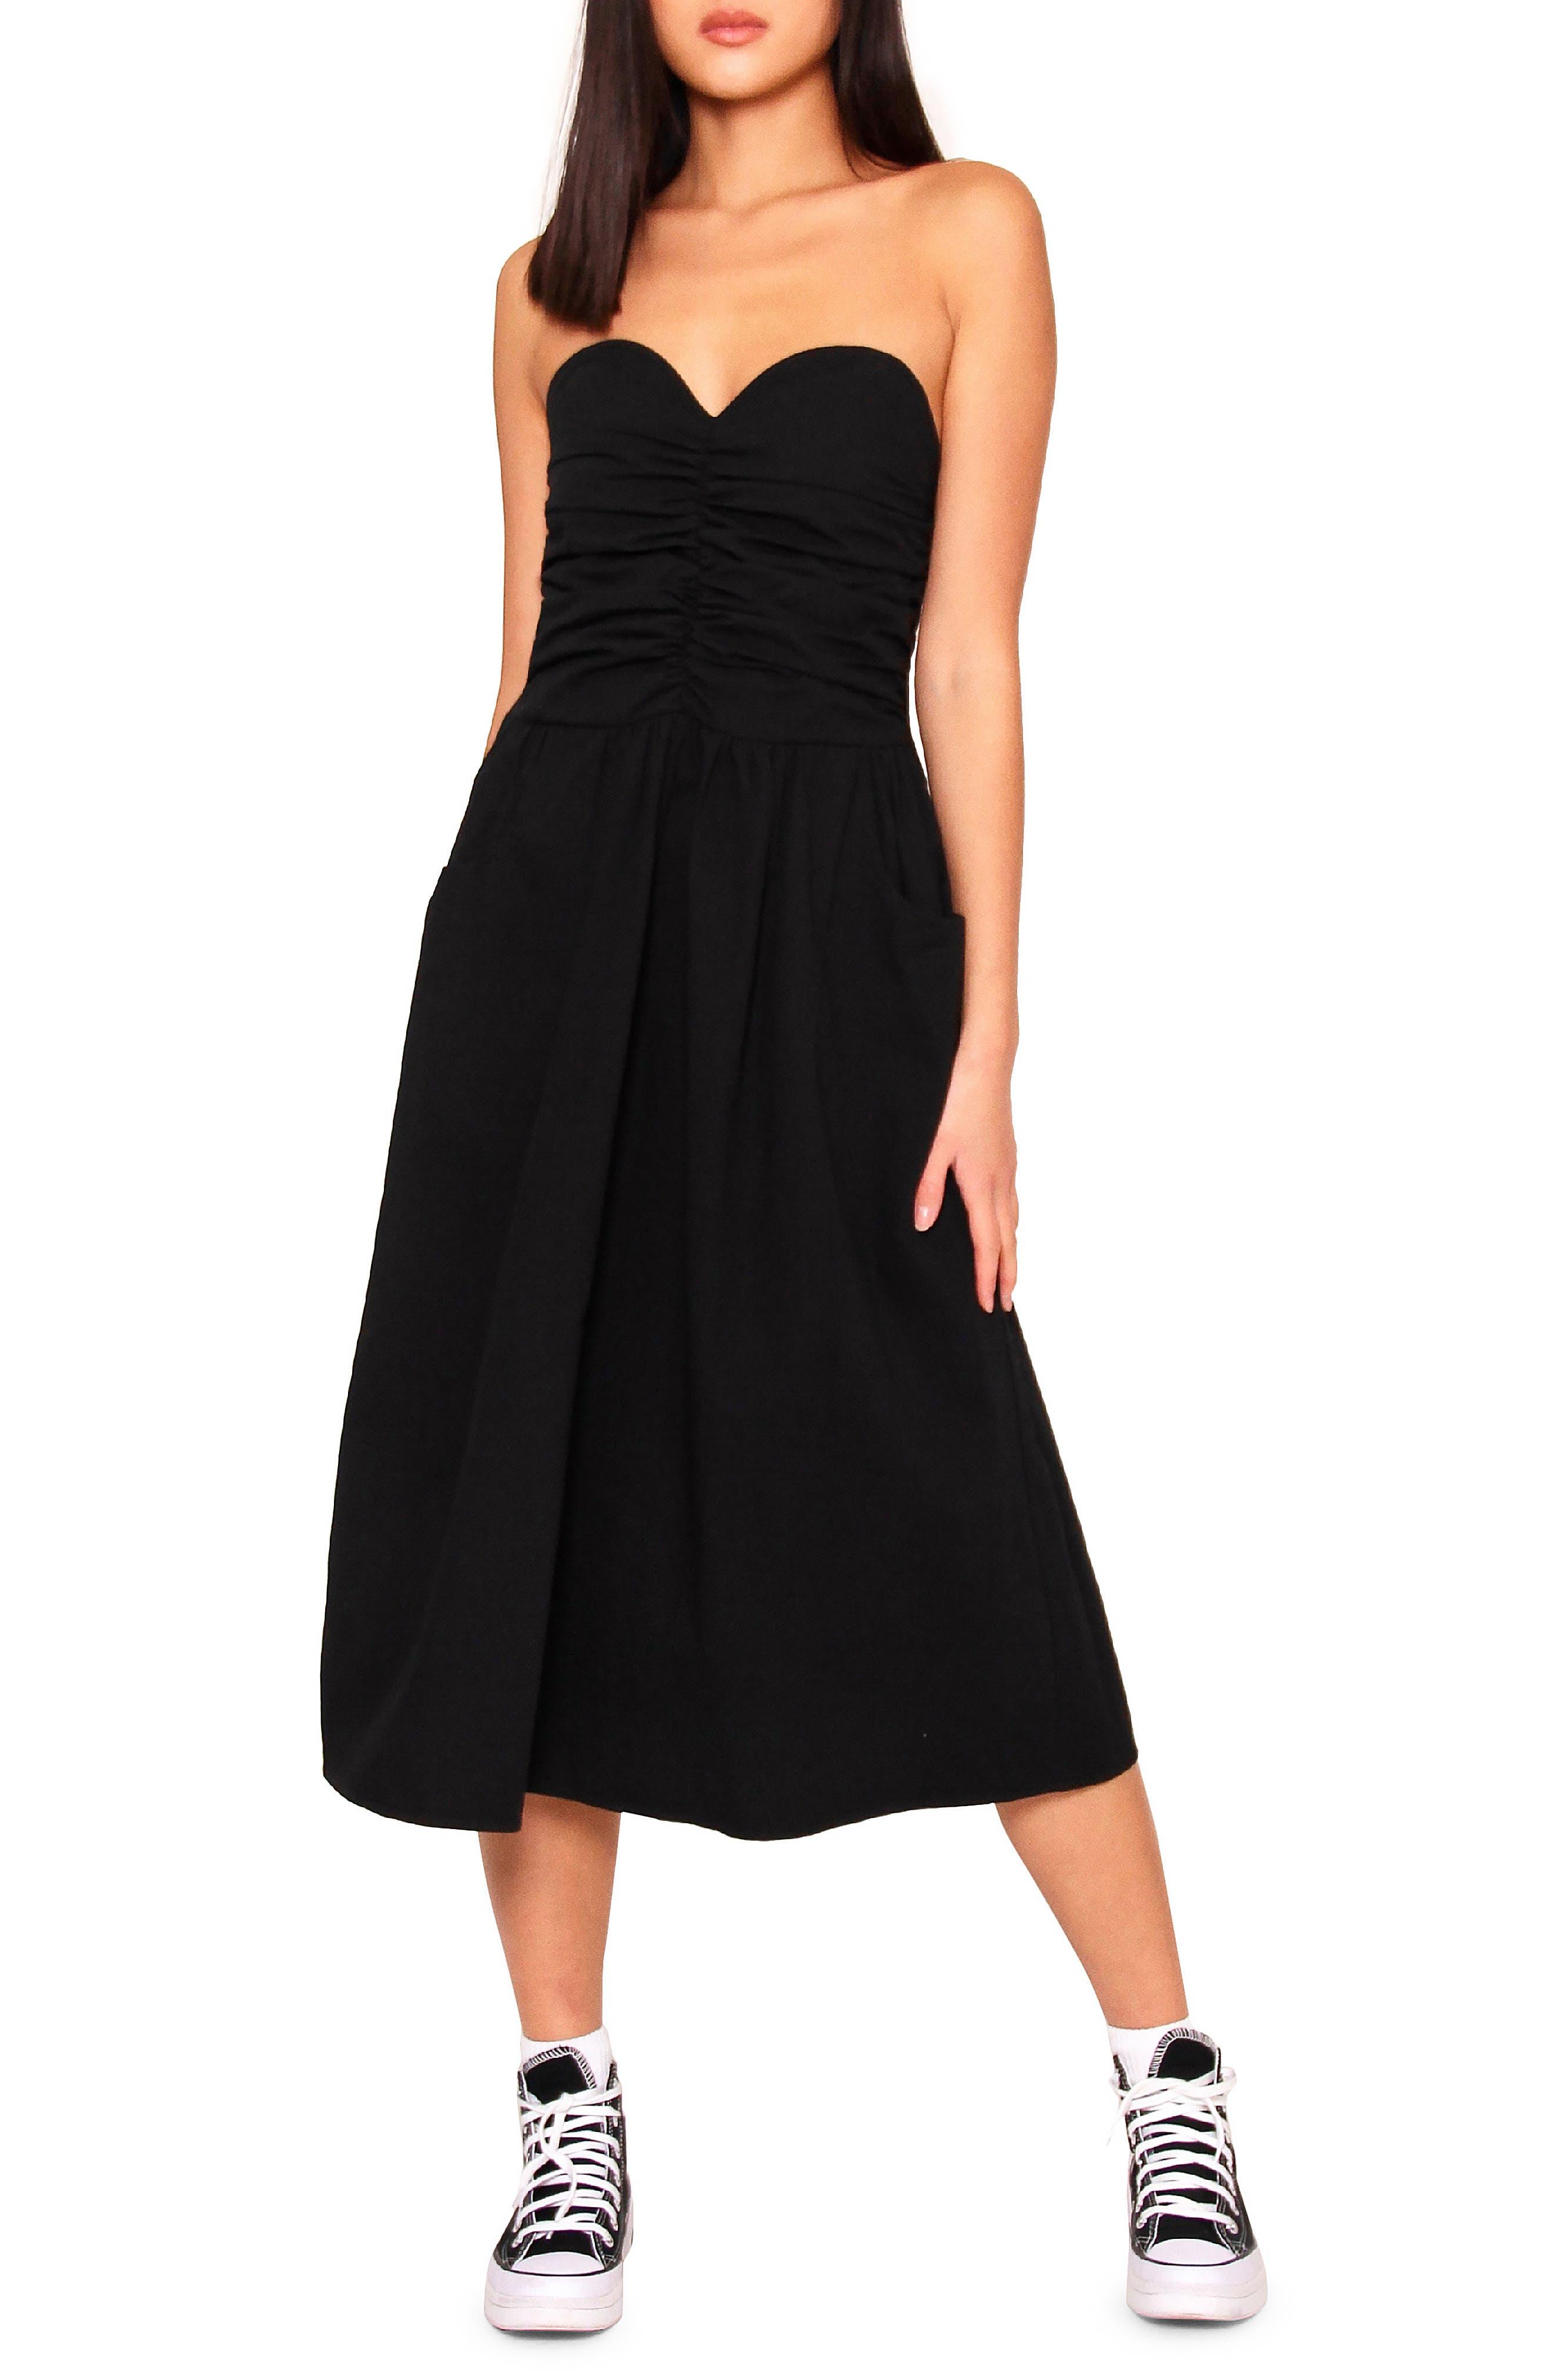 Bessy Strapless Midi Dress